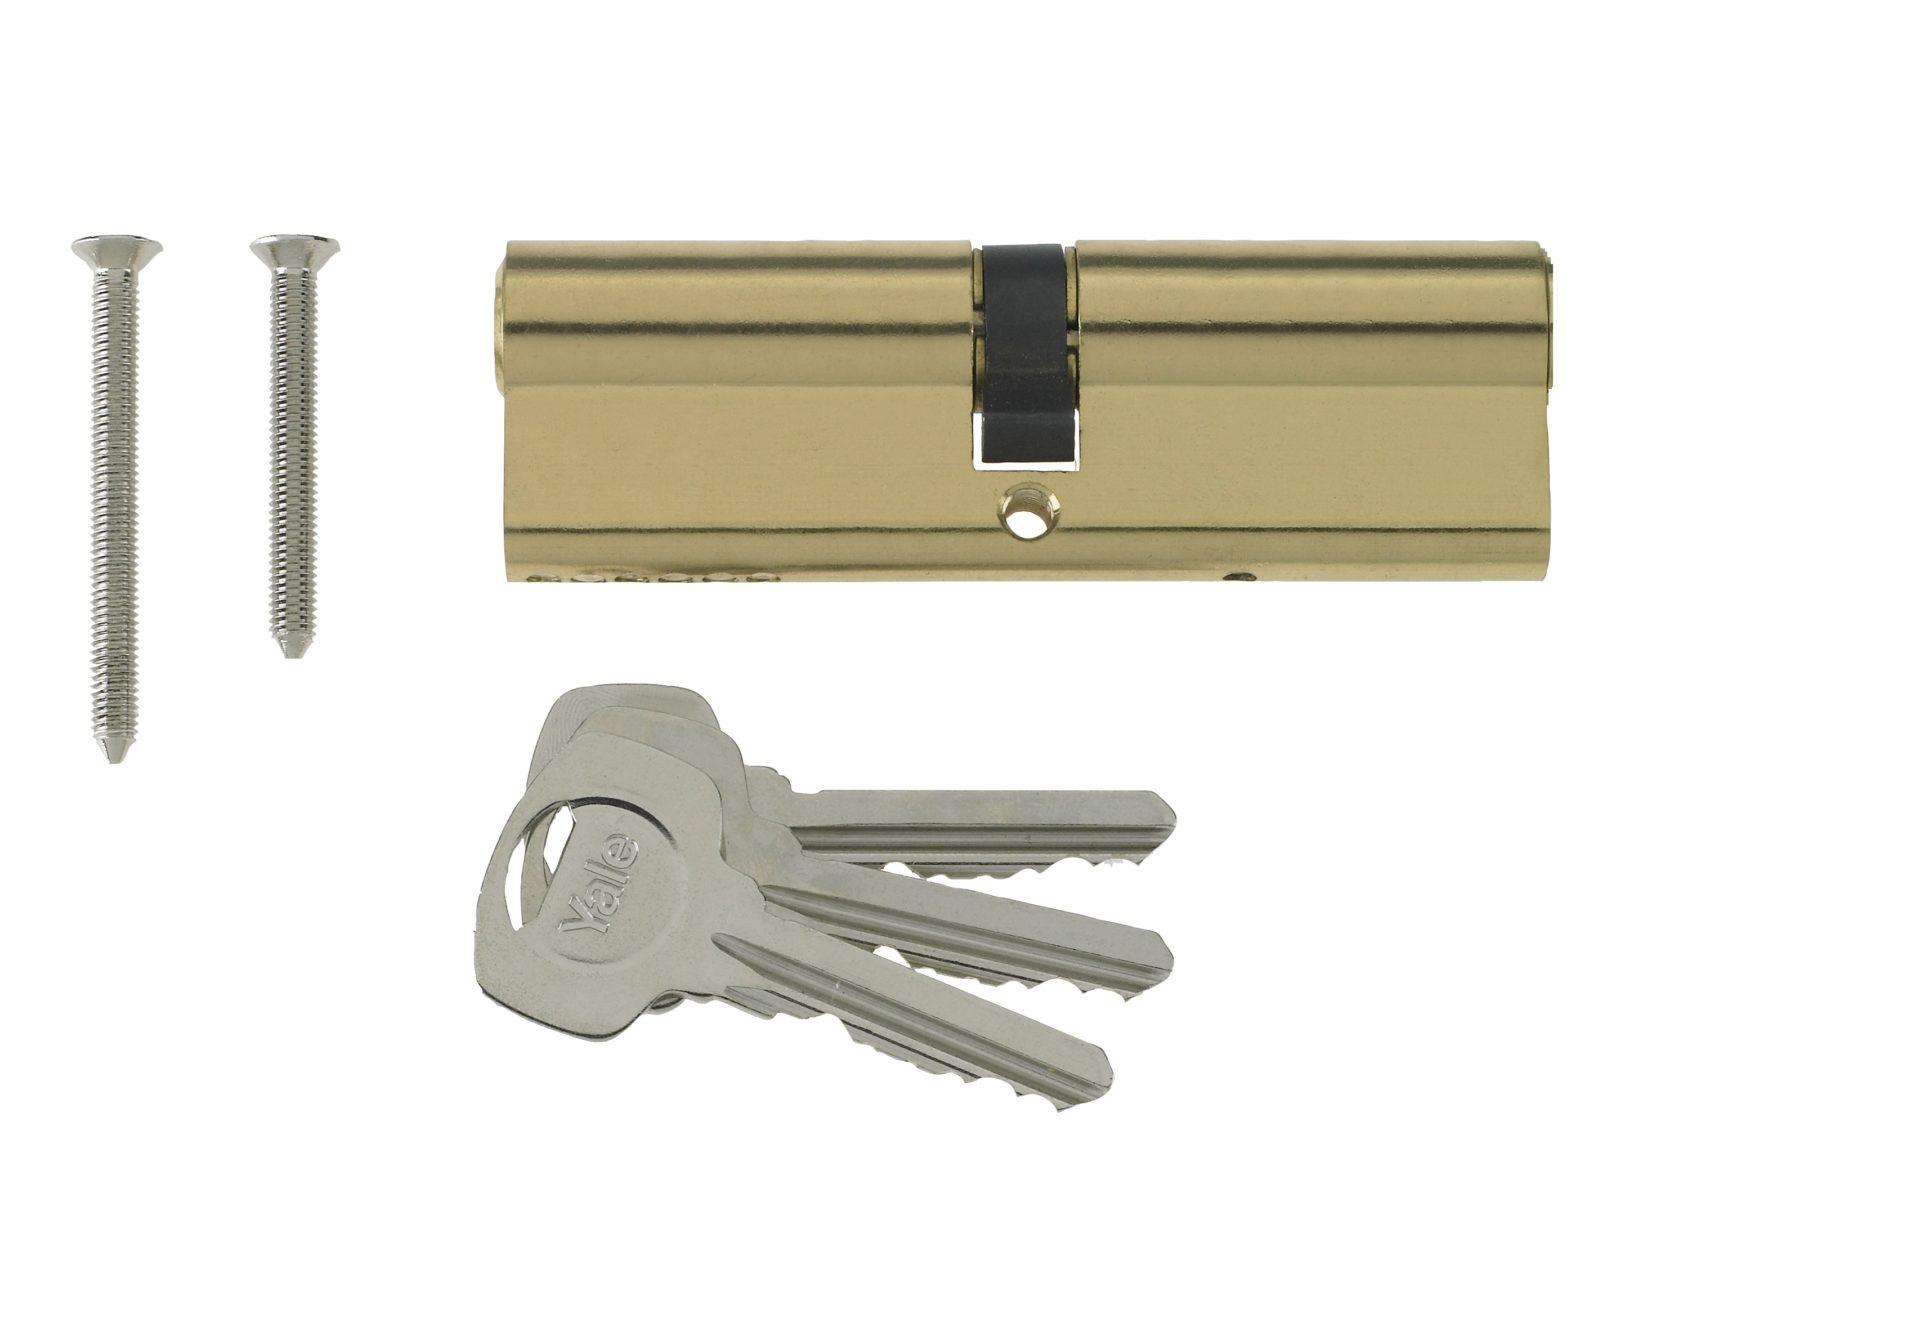 Yale 6 Pin Euro Profile Cylinder Lock Brass 35/55 (90mm) C/w 3 Keys